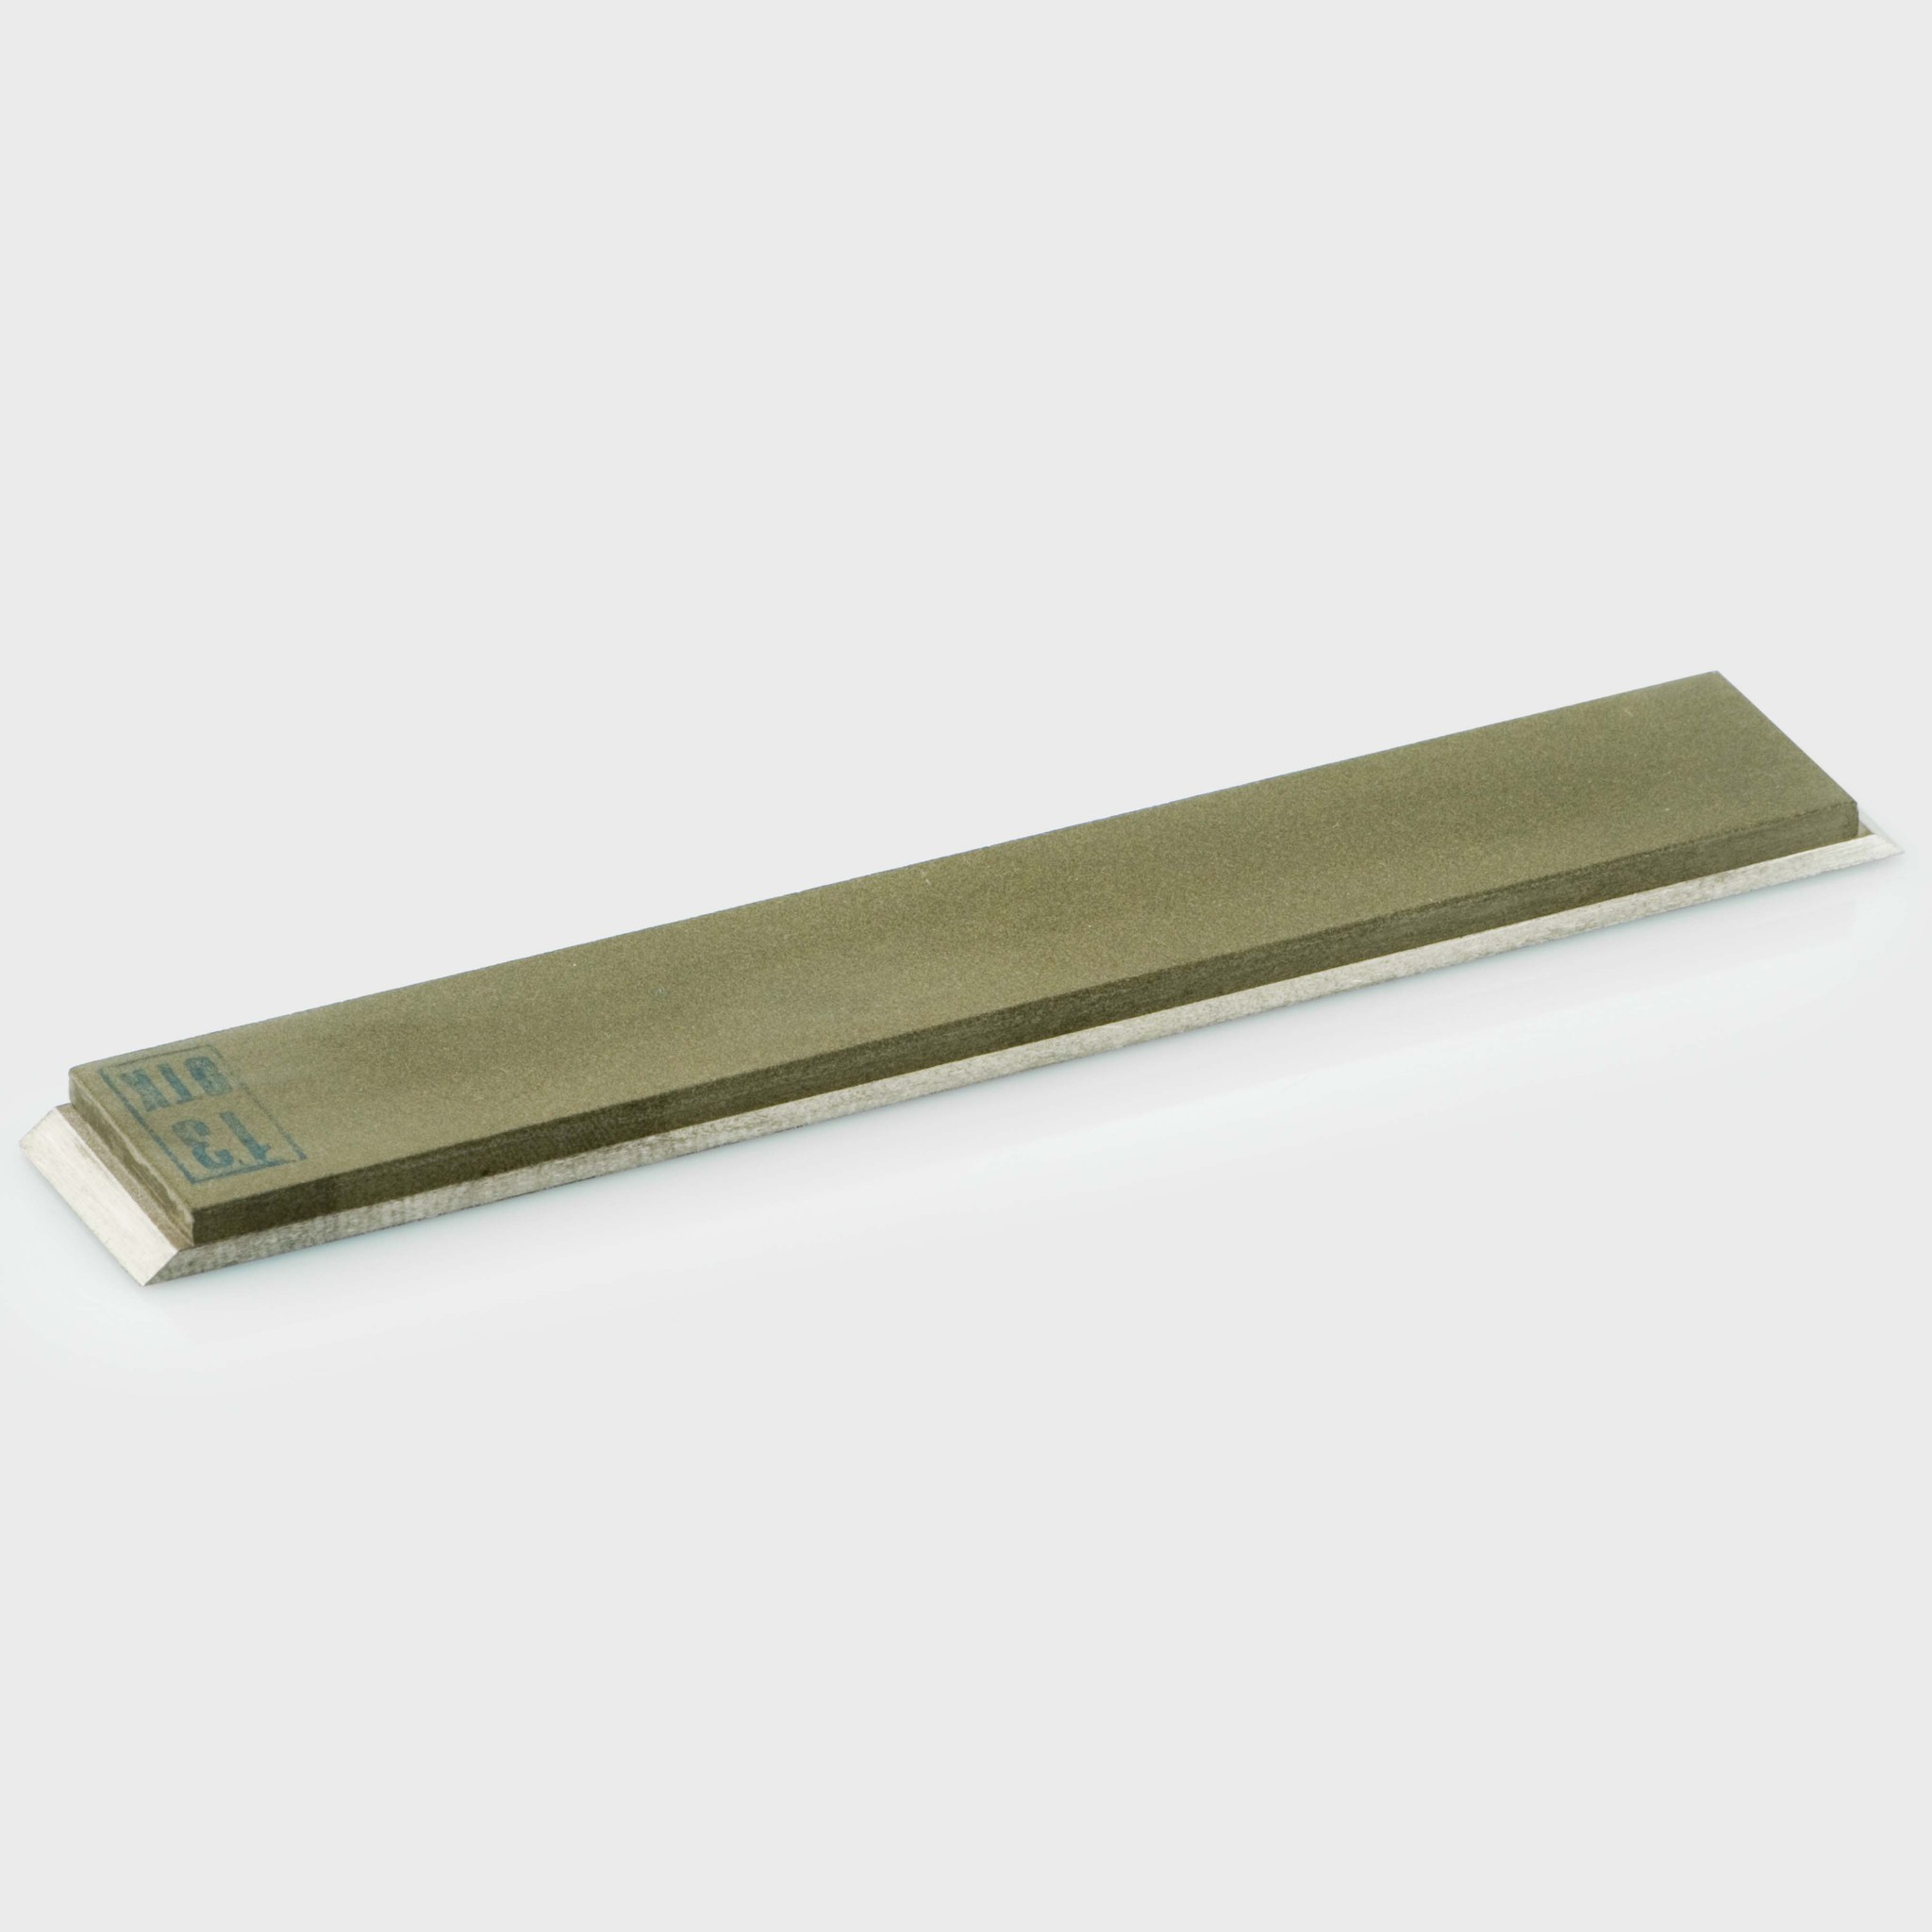 150х25х6 мм для Apex Edge Pro, ЖУК Алмазный брусок 150х25х6 160/125 100% IMGP2750_copy.jpg